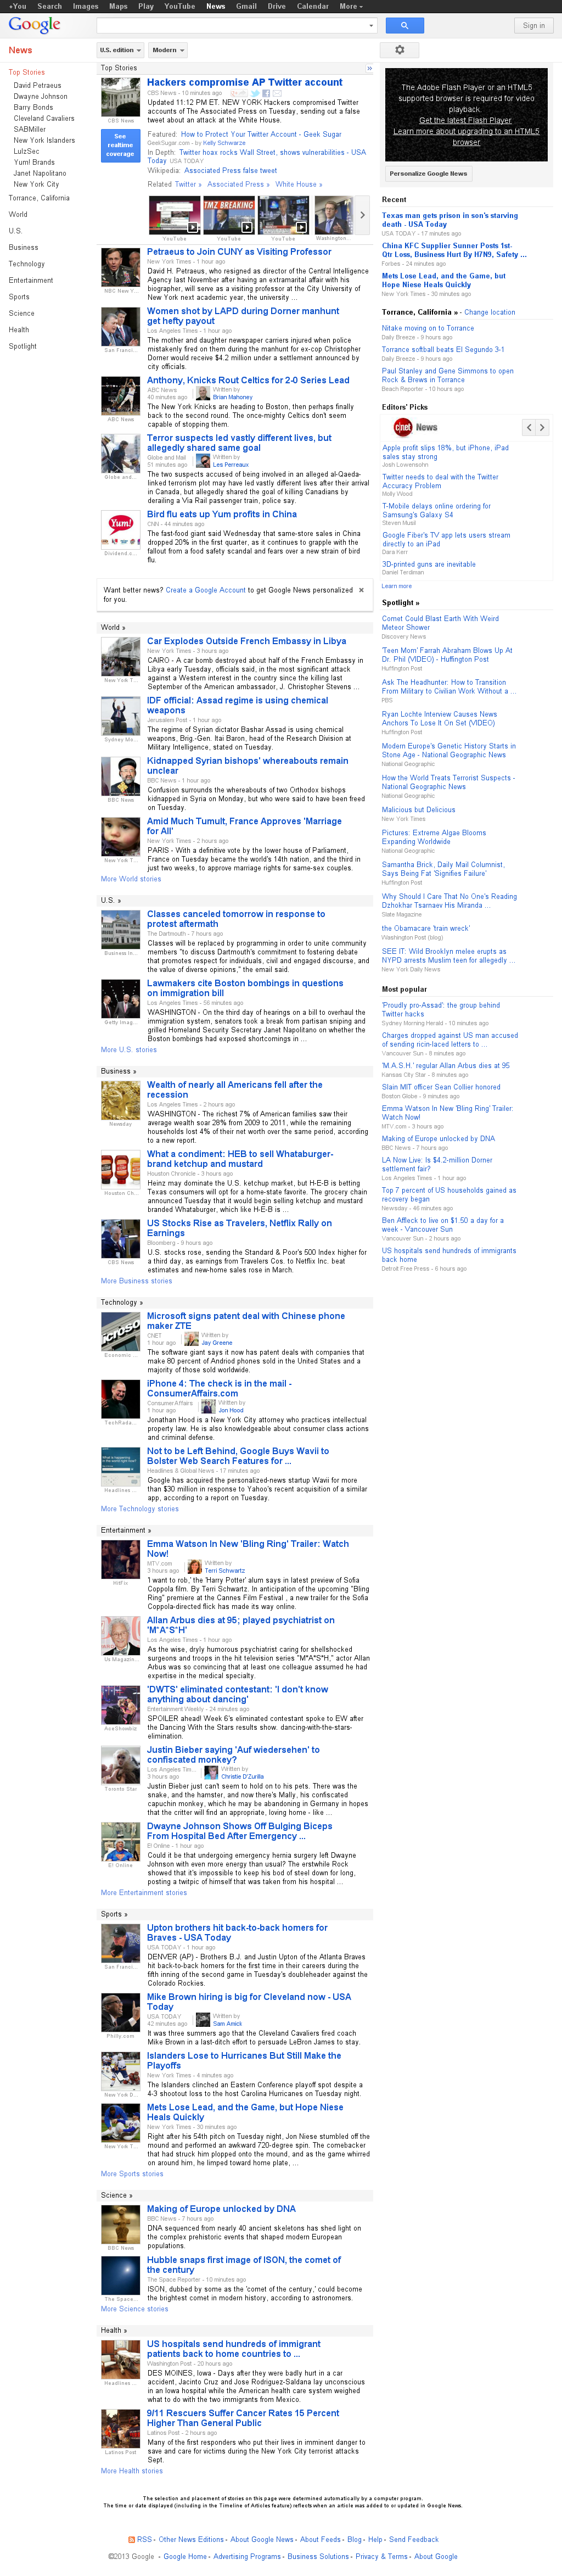 Google News at Wednesday April 24, 2013, 4:08 a.m. UTC